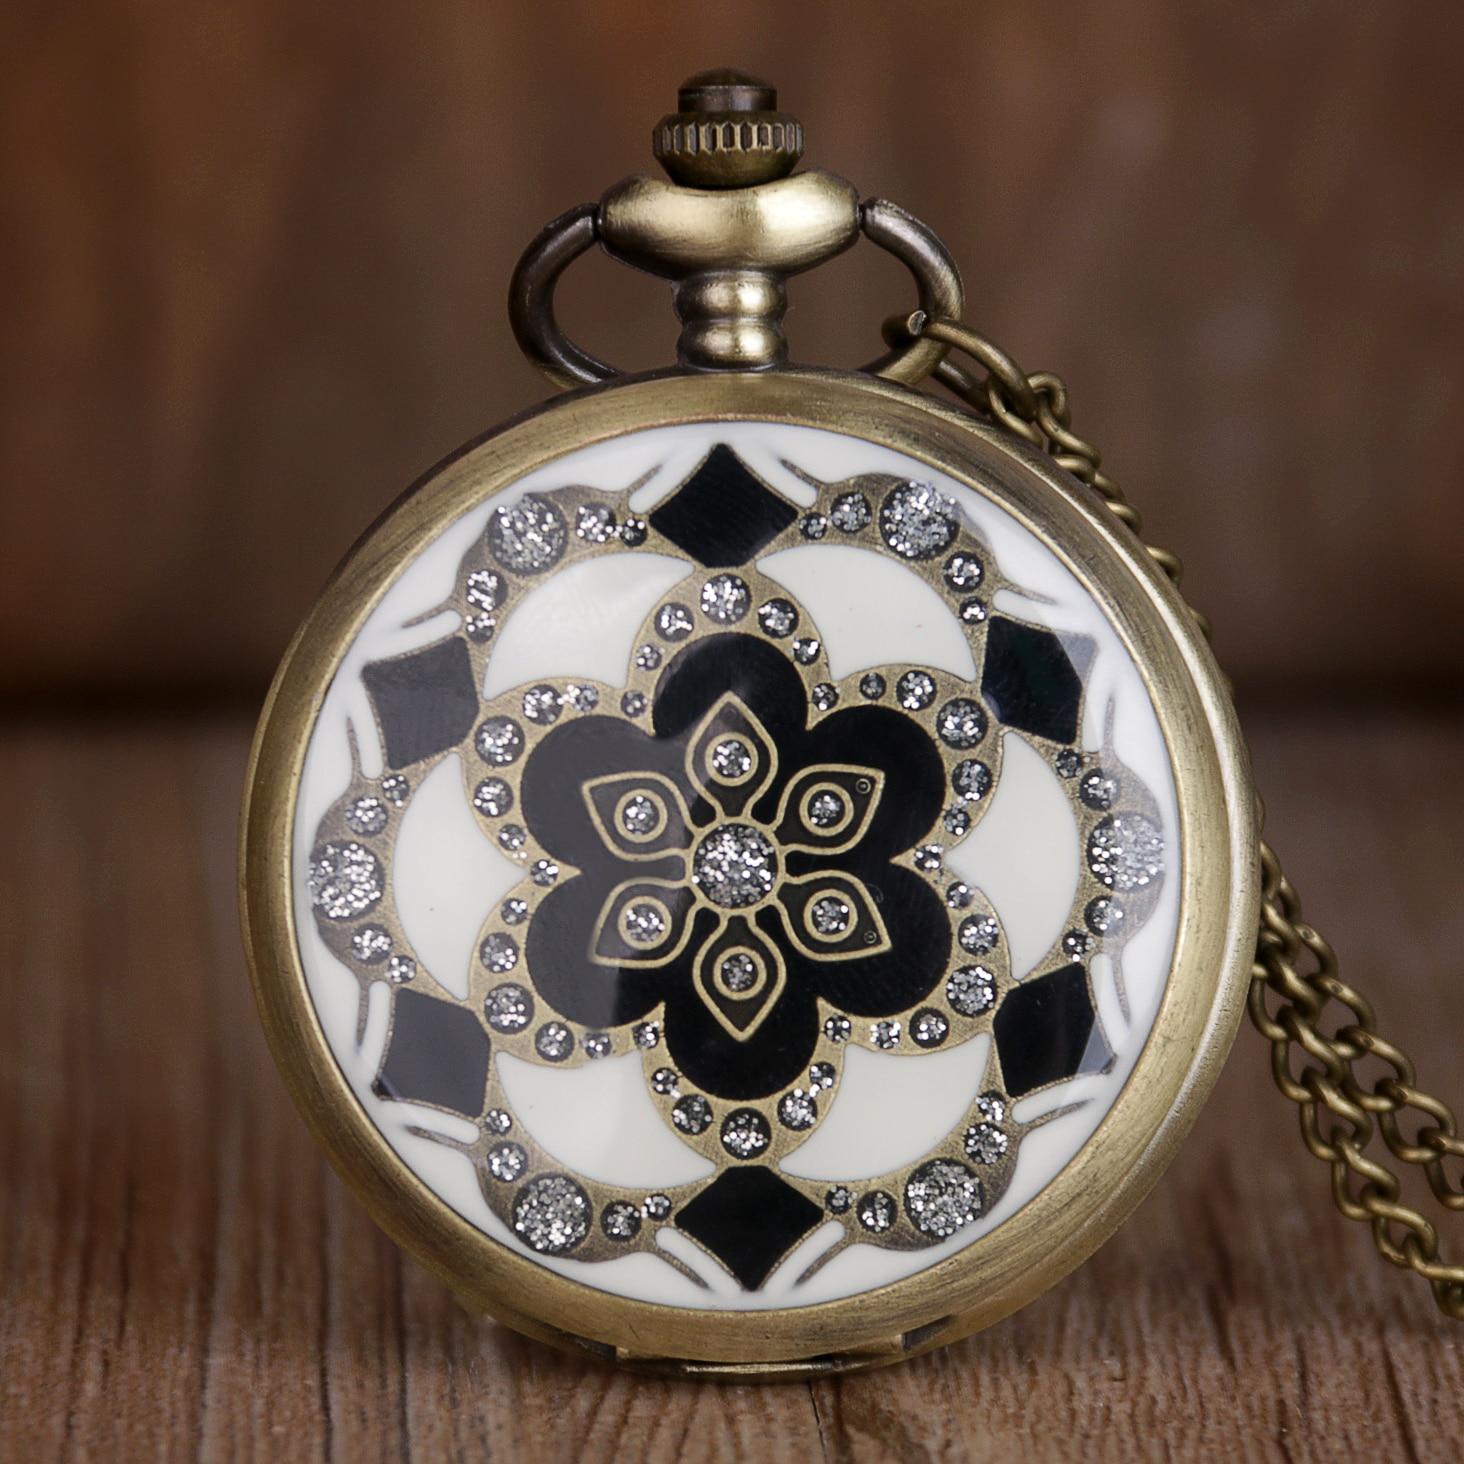 Women Quartz Watches Vintage Unique Designs Pocket Watch Retro Bronze Analog Pendant Necklace 37.5 Chain Children Girl Gift